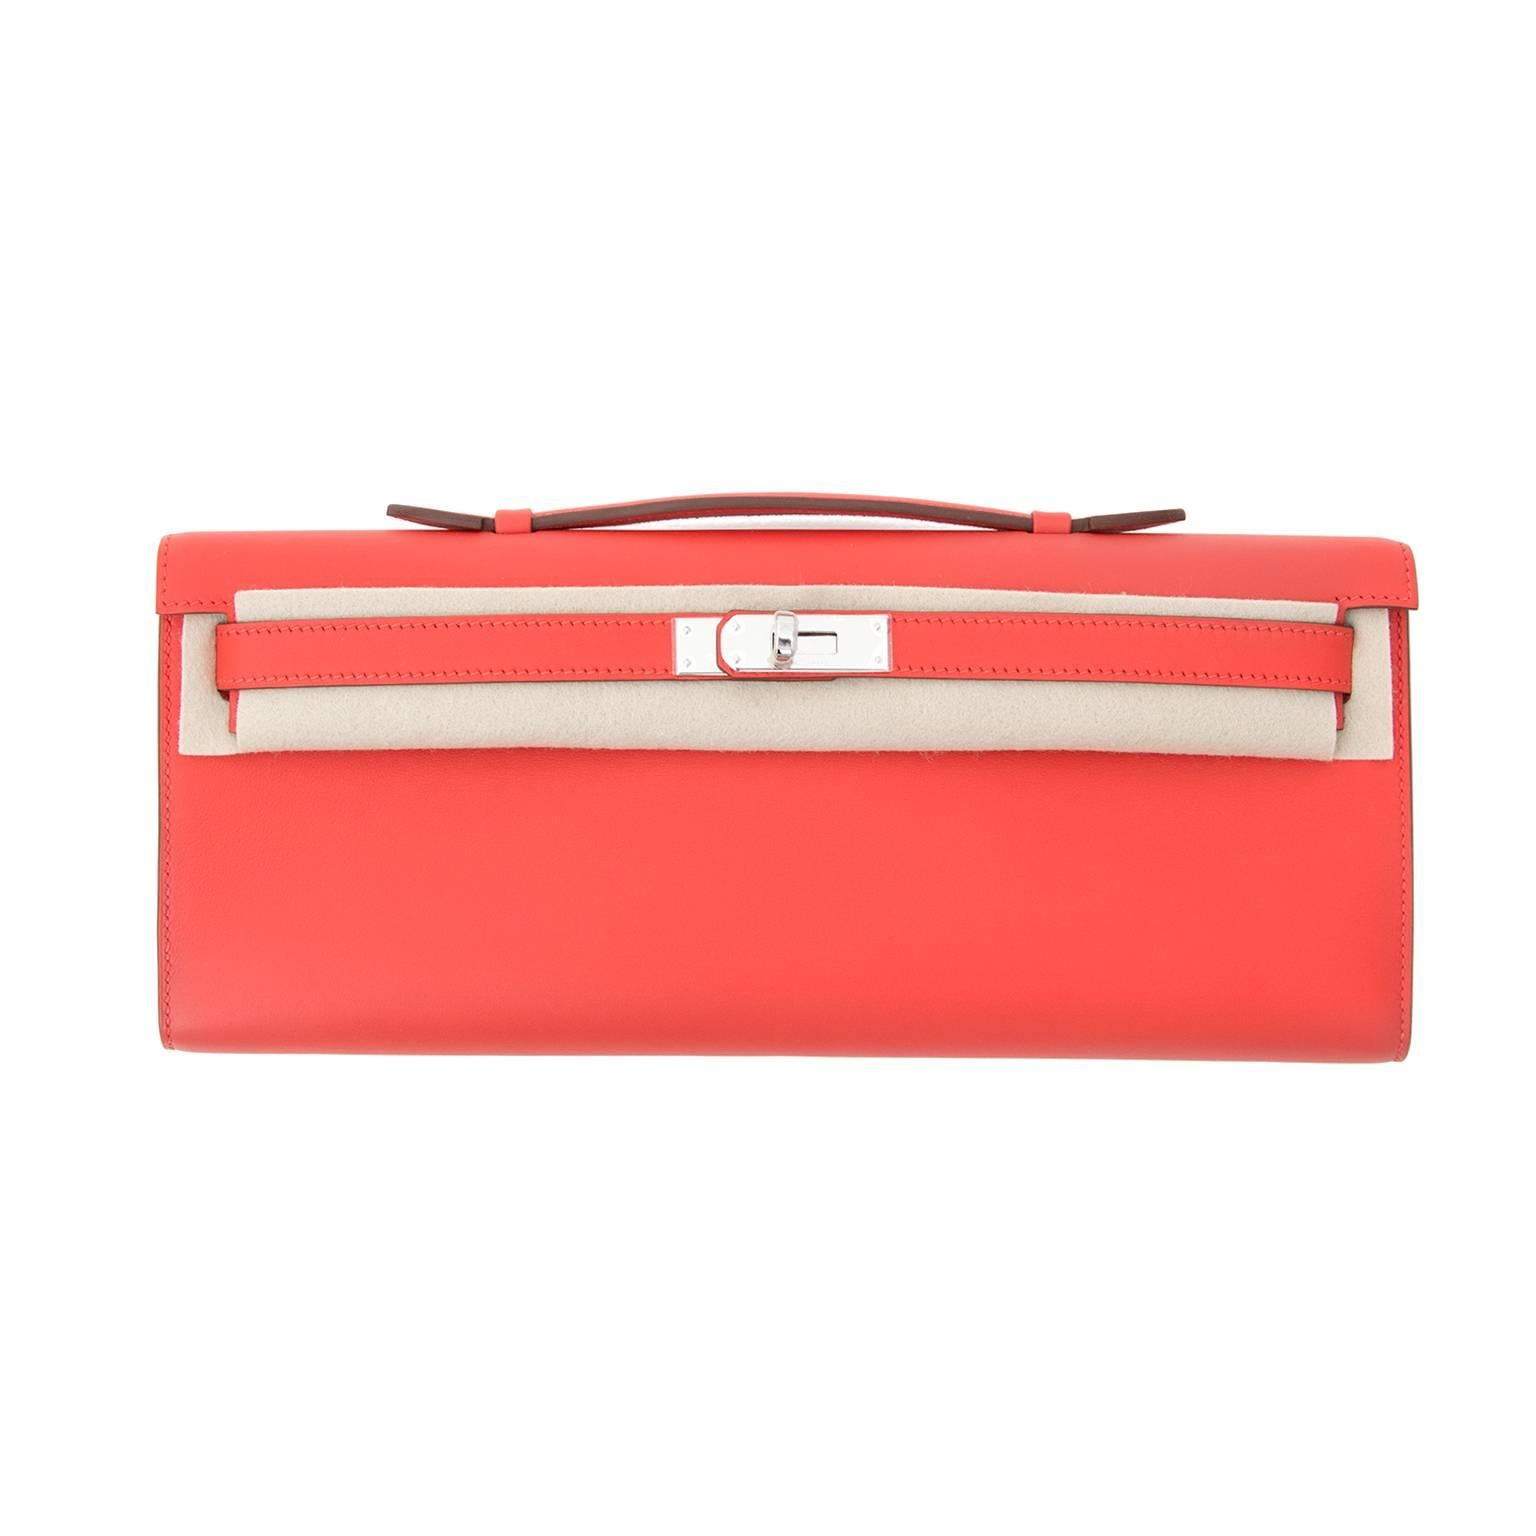 6ca760fcfc21 Labellov Handbags and Purses - 1stdibs - Page 8